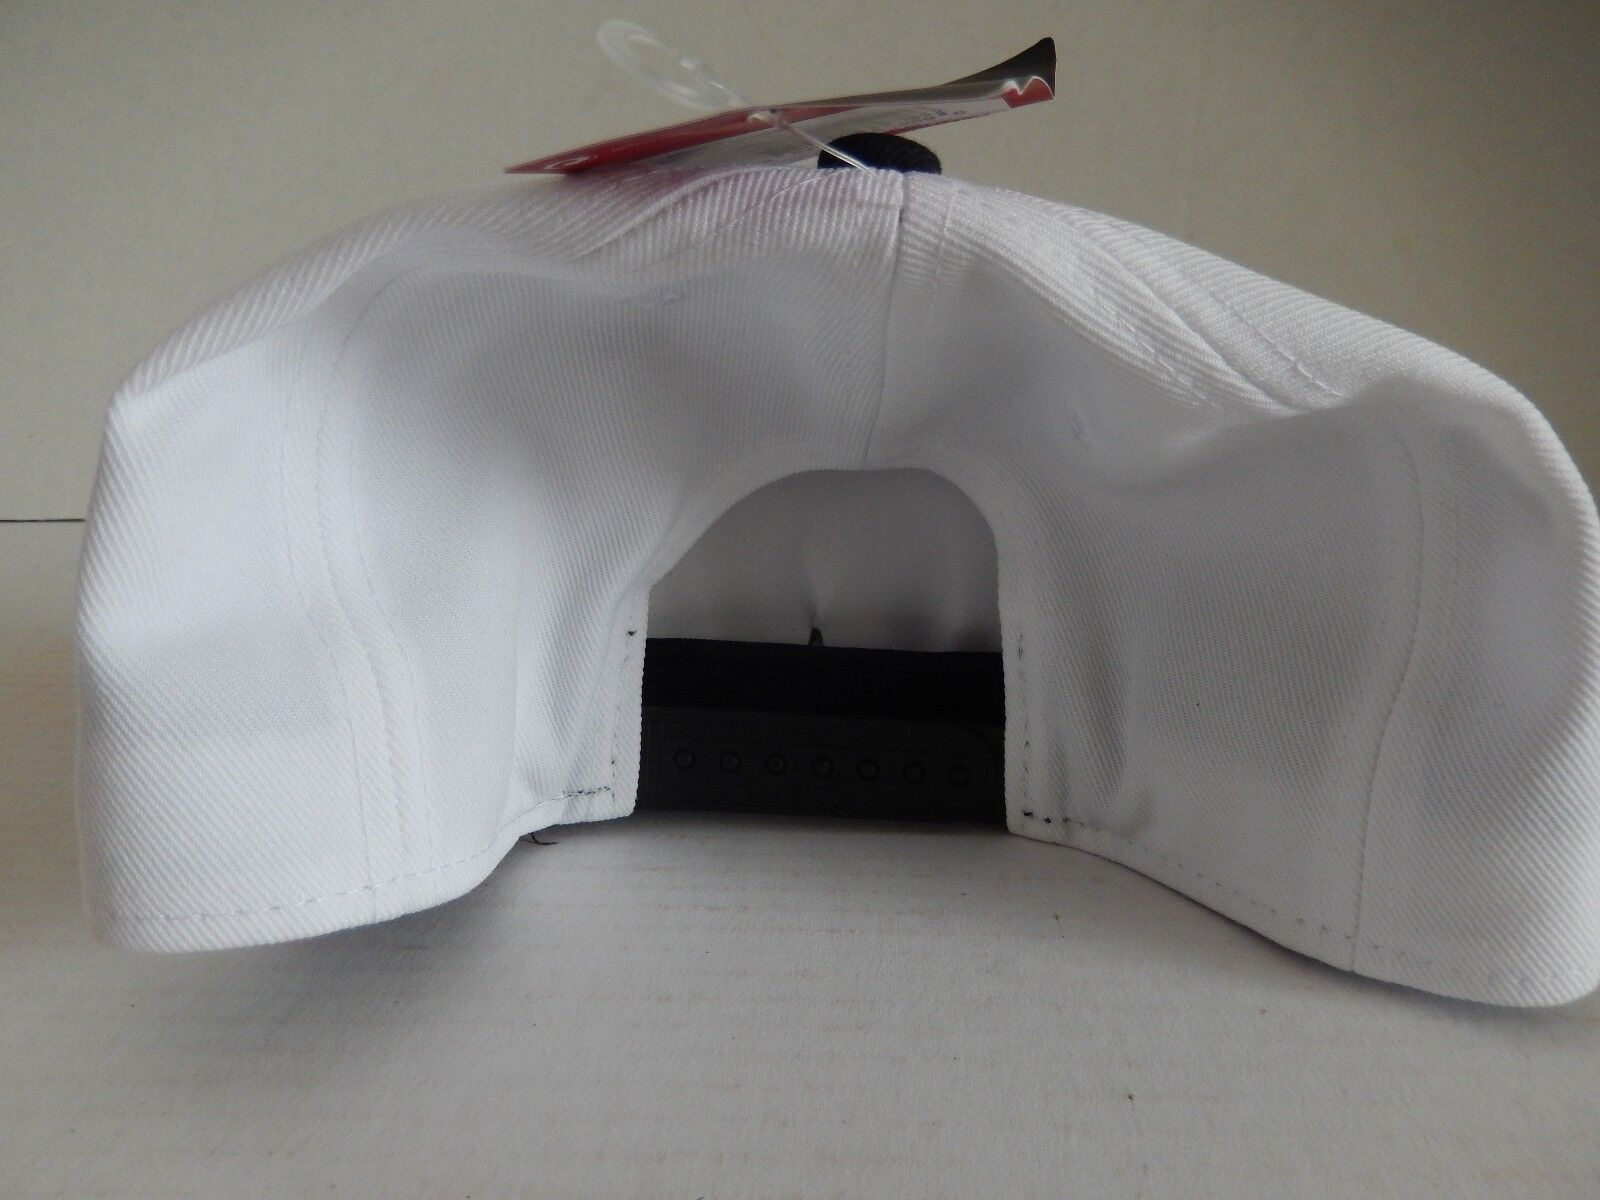 bf1491f632b6 Nike Gennady GGG Golovkin Jordan BRAND Hat White Black Red Aq9329 ...